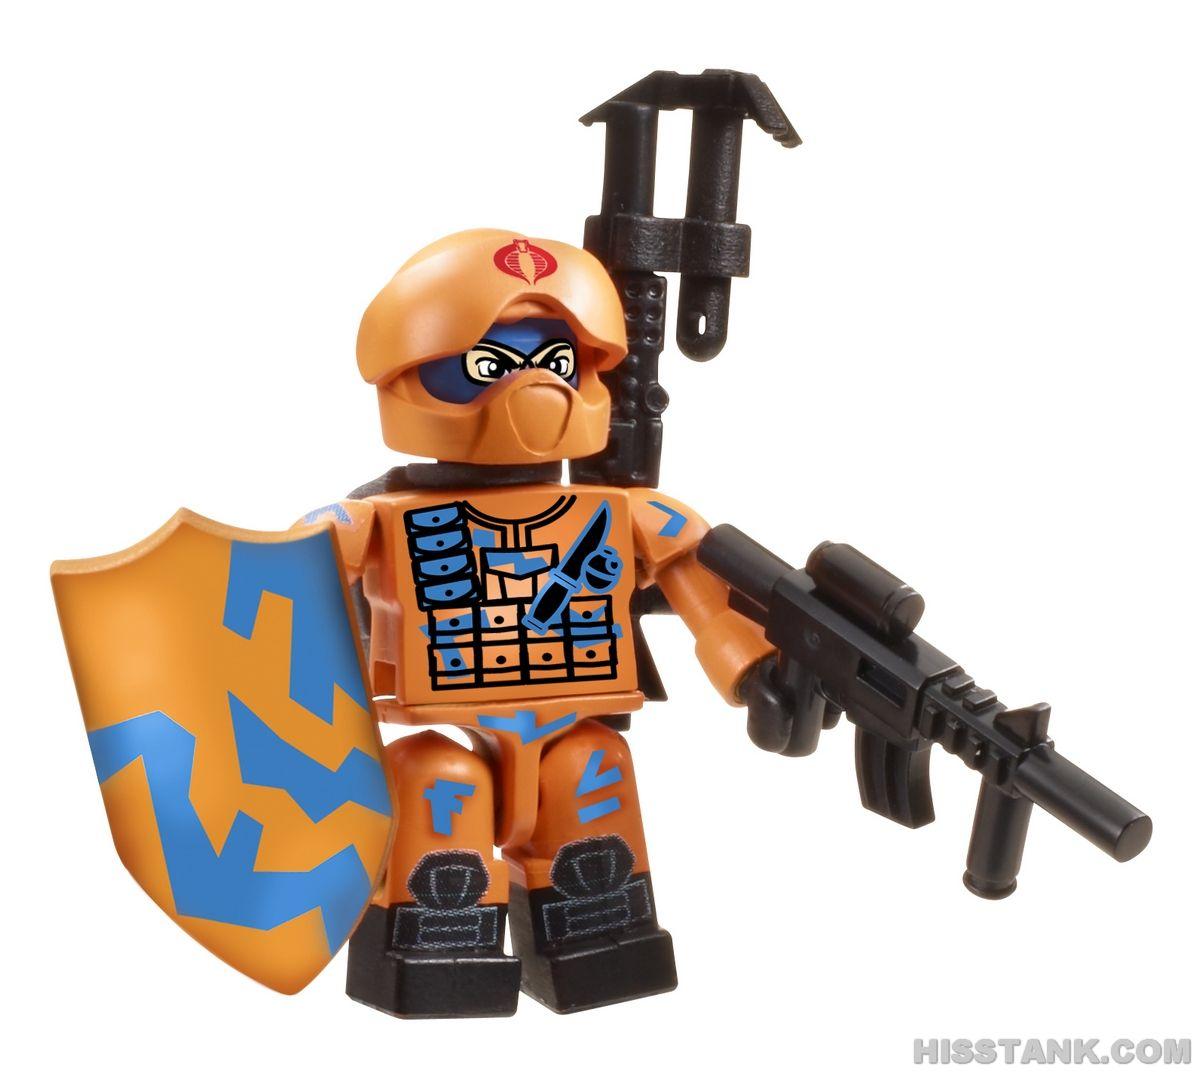 Ghoststriker X-16 KRE-O GI Joe Vehicle Kreo